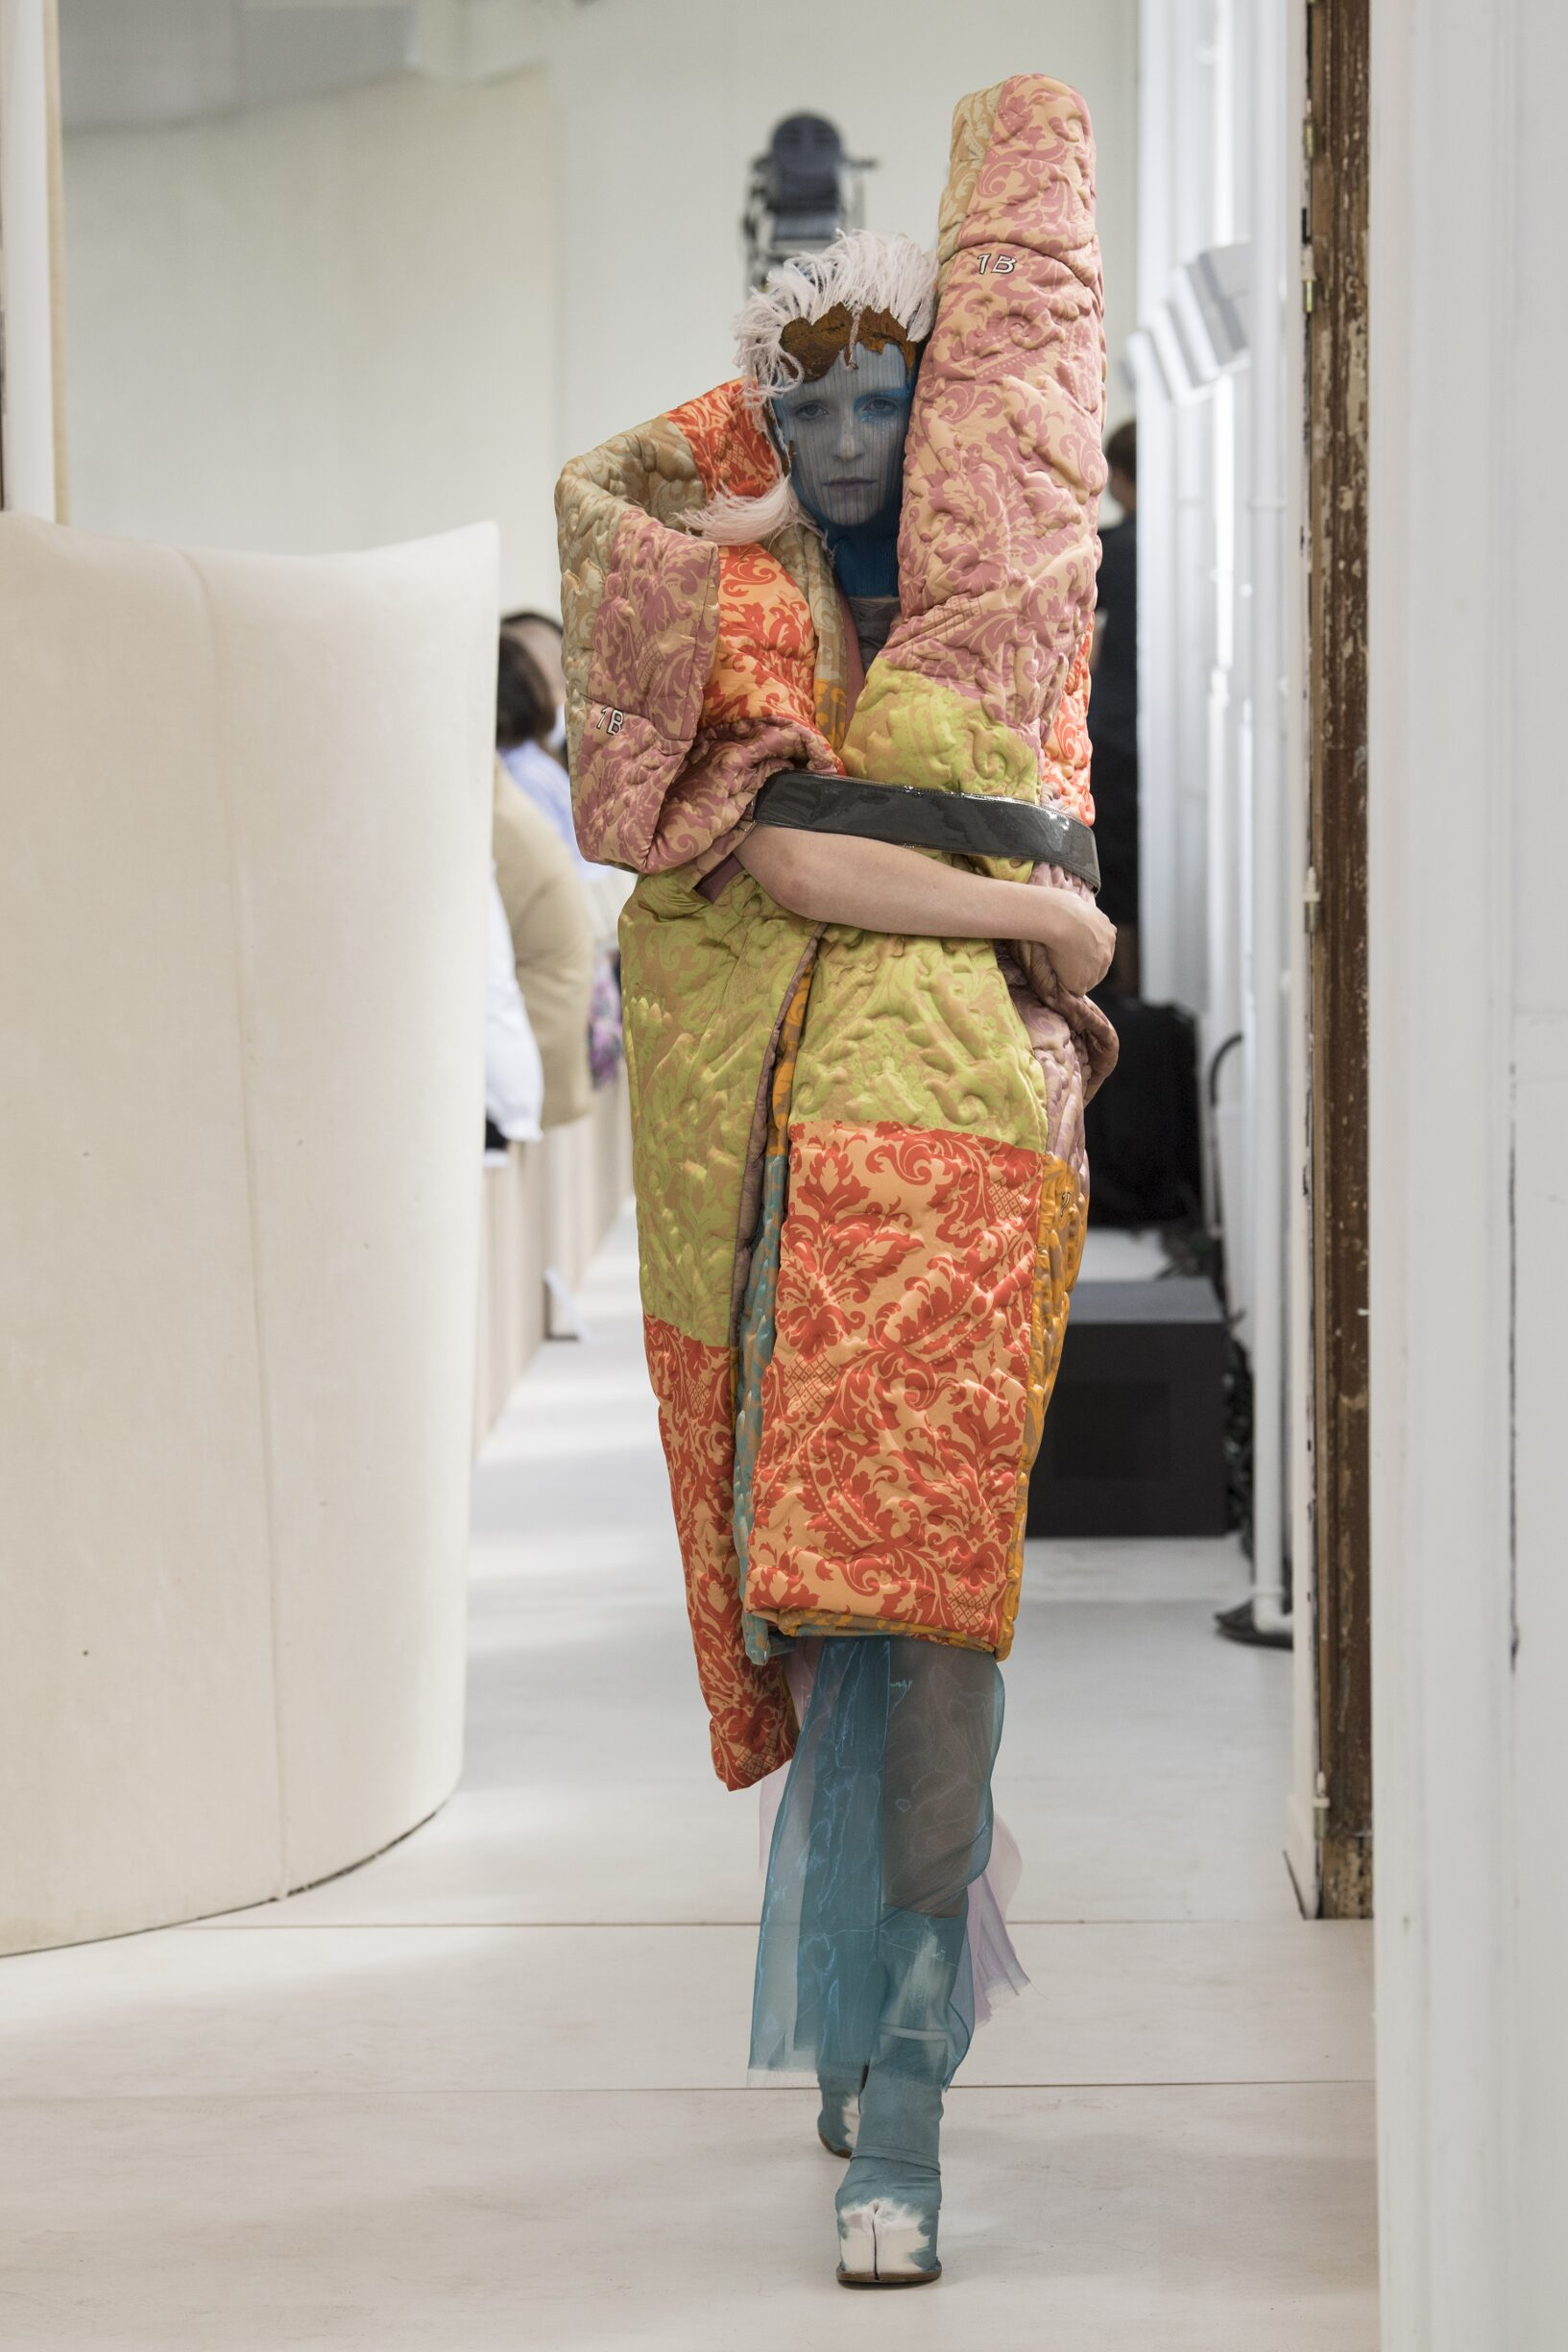 Maison Margiela Artisanal Paris Fashion Week Womenswear Trends